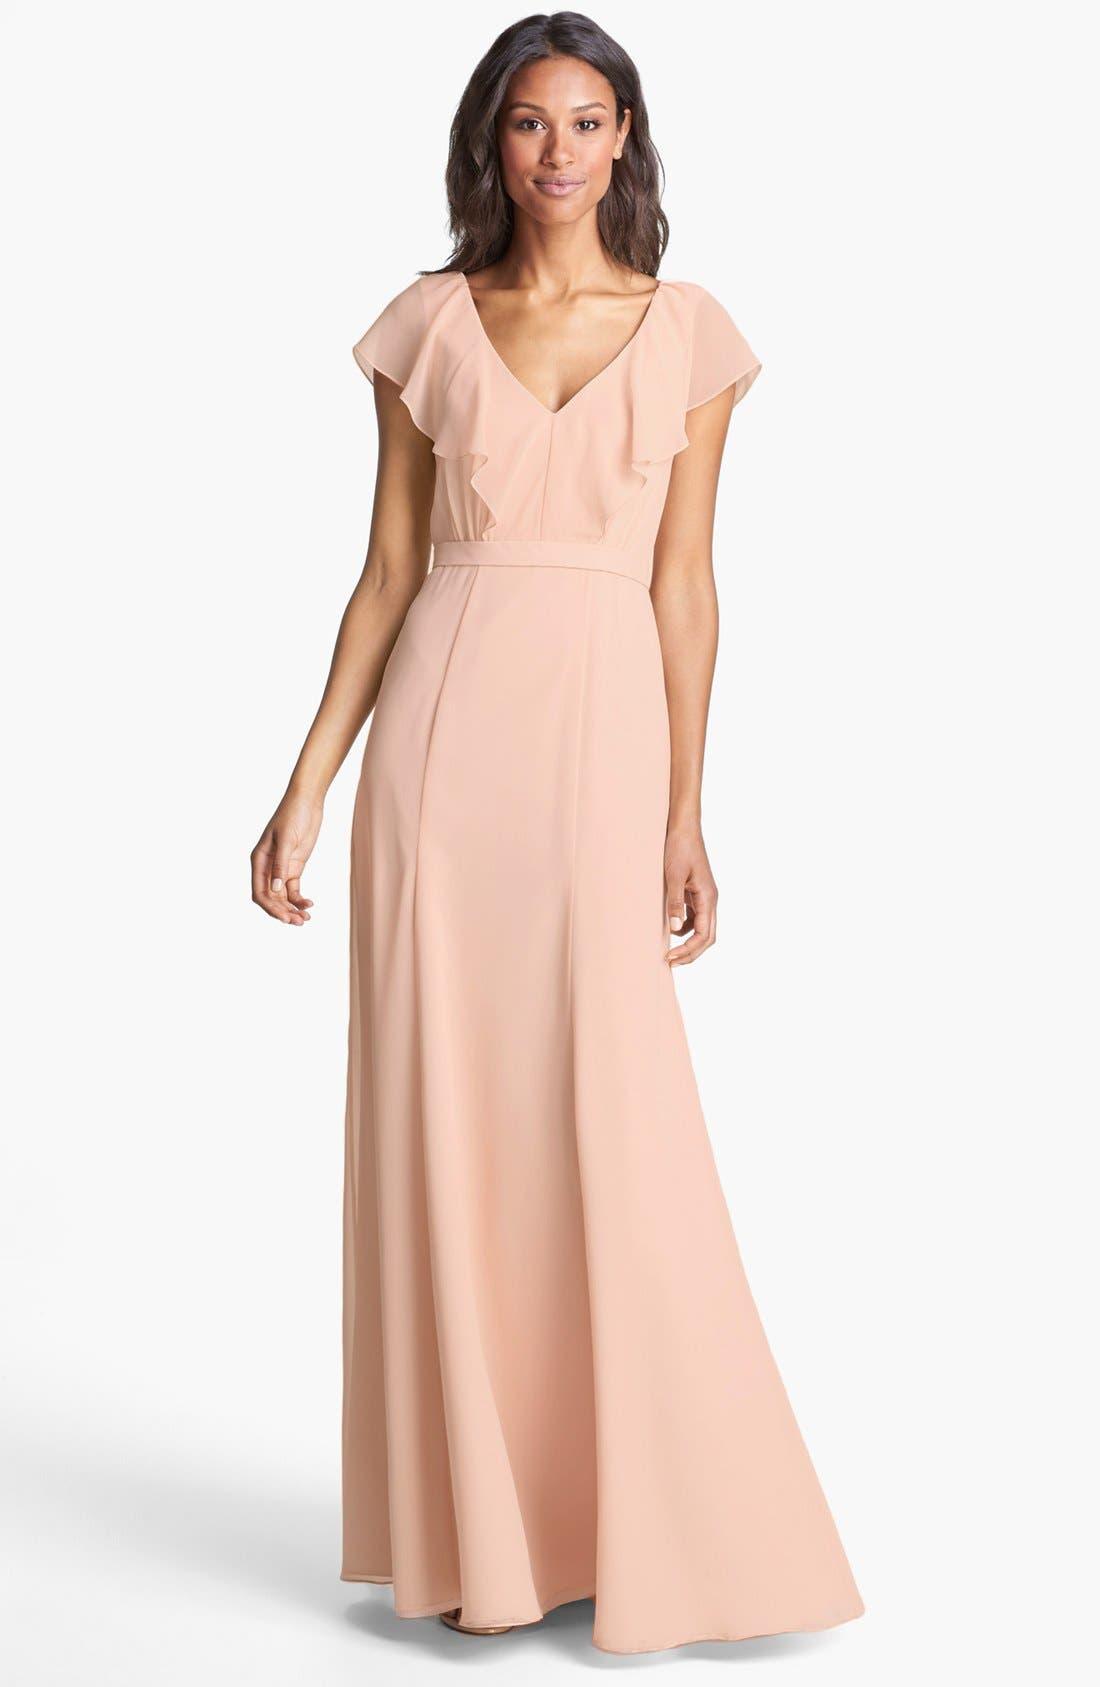 Alternate Image 1 Selected - Jenny Yoo 'Cecilia' Ruffled V-Neck Chiffon Long Dress (Online Only)